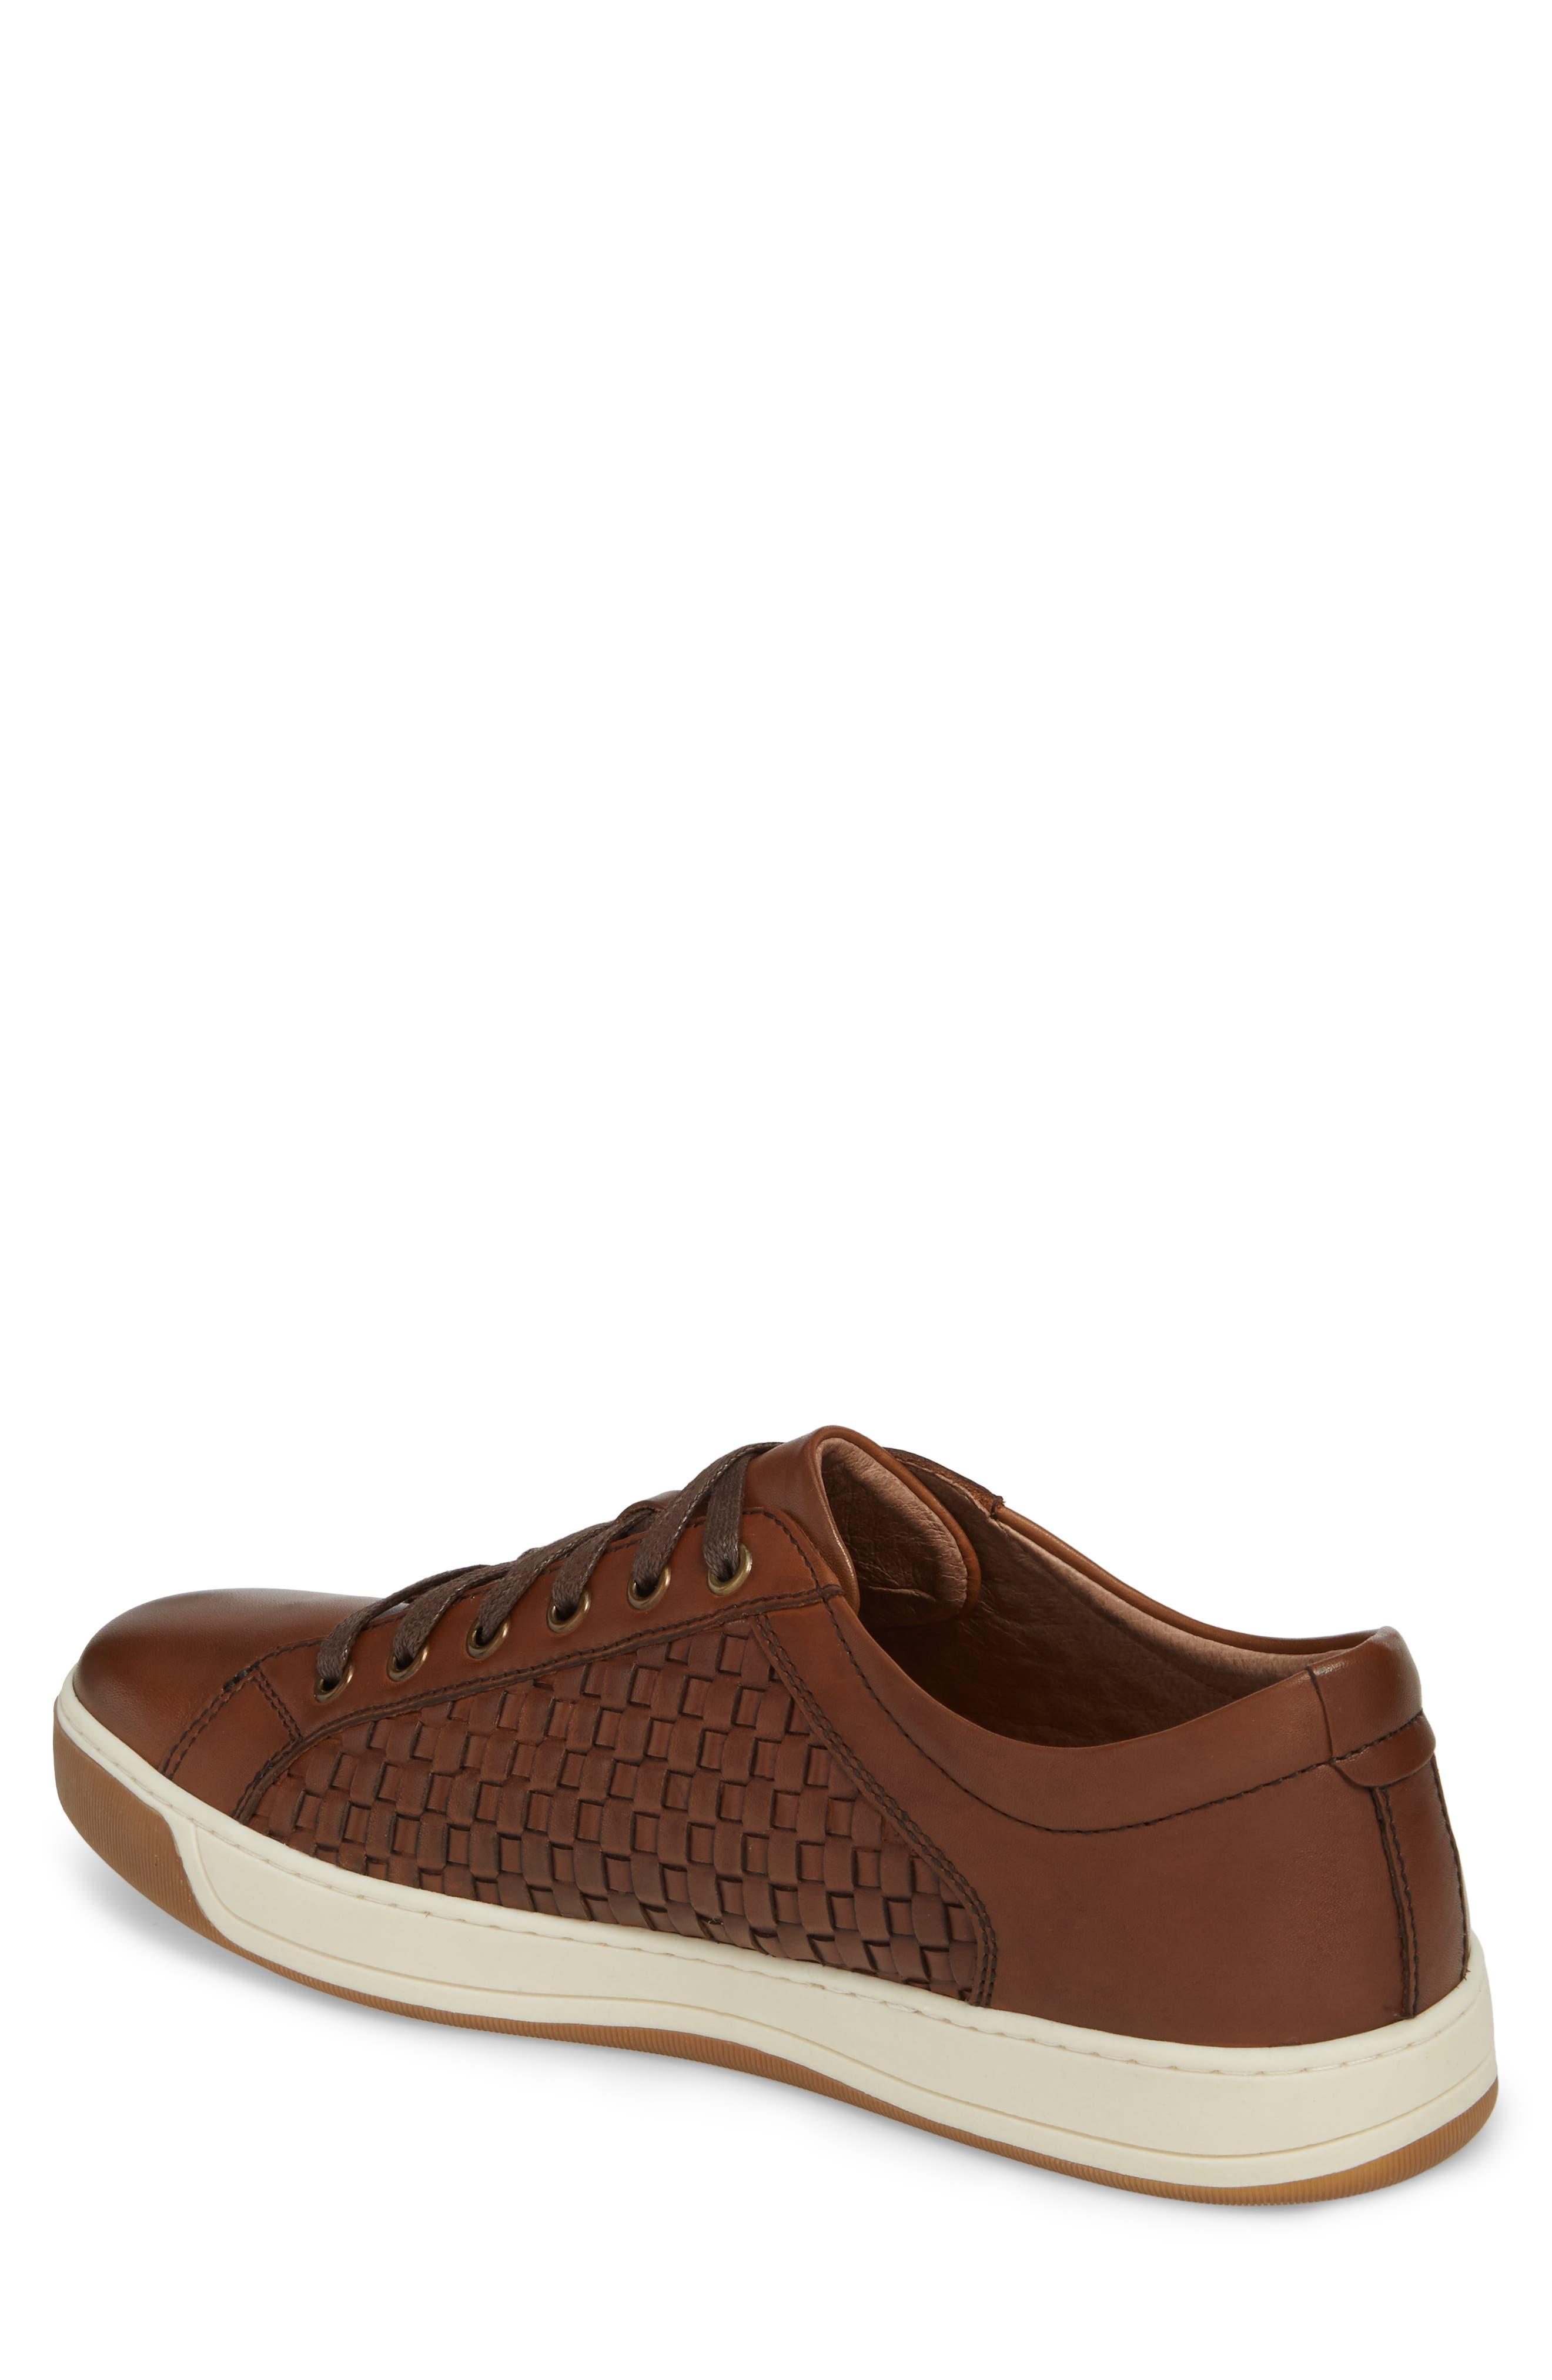 Alternate Image 2  - J&M 1850 Allister Woven Low Top Sneaker (Men)